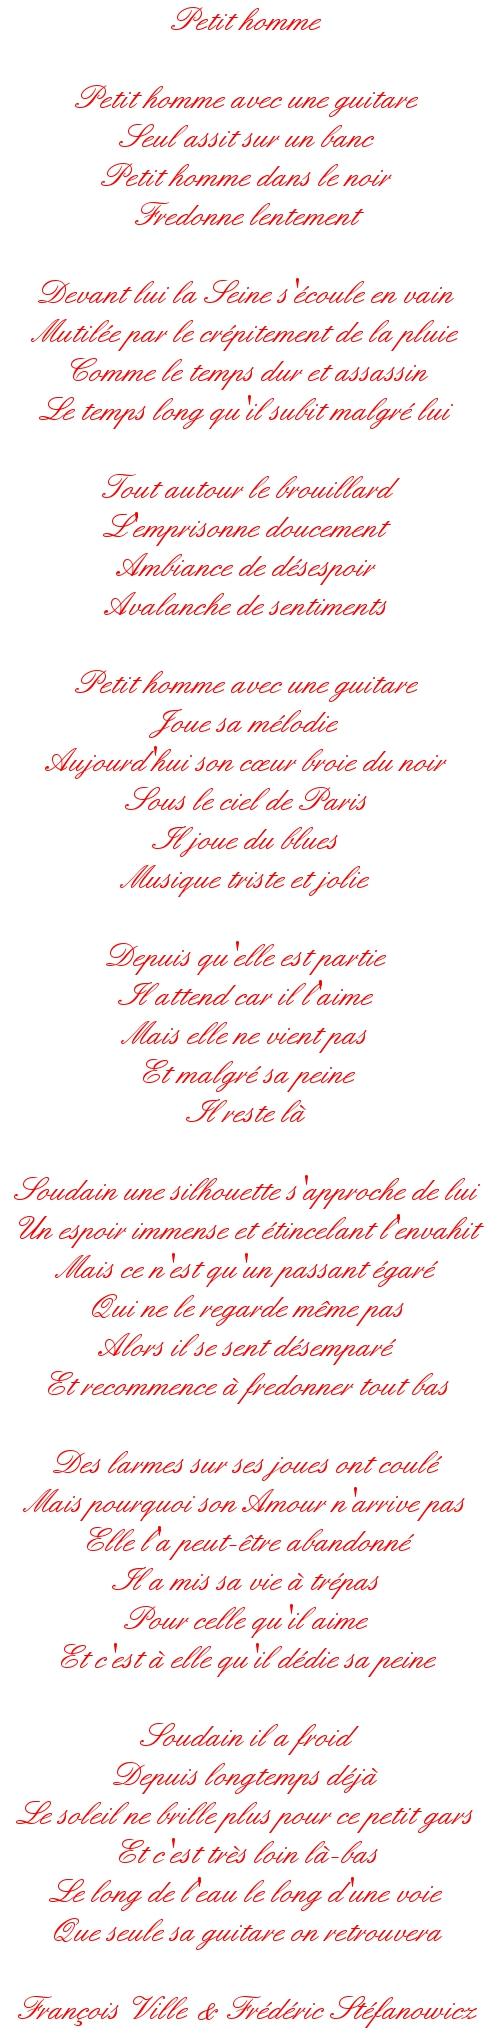 http://francoisville.free.fr/photos/petit%20homme%20-%20francois%20ville.jpg